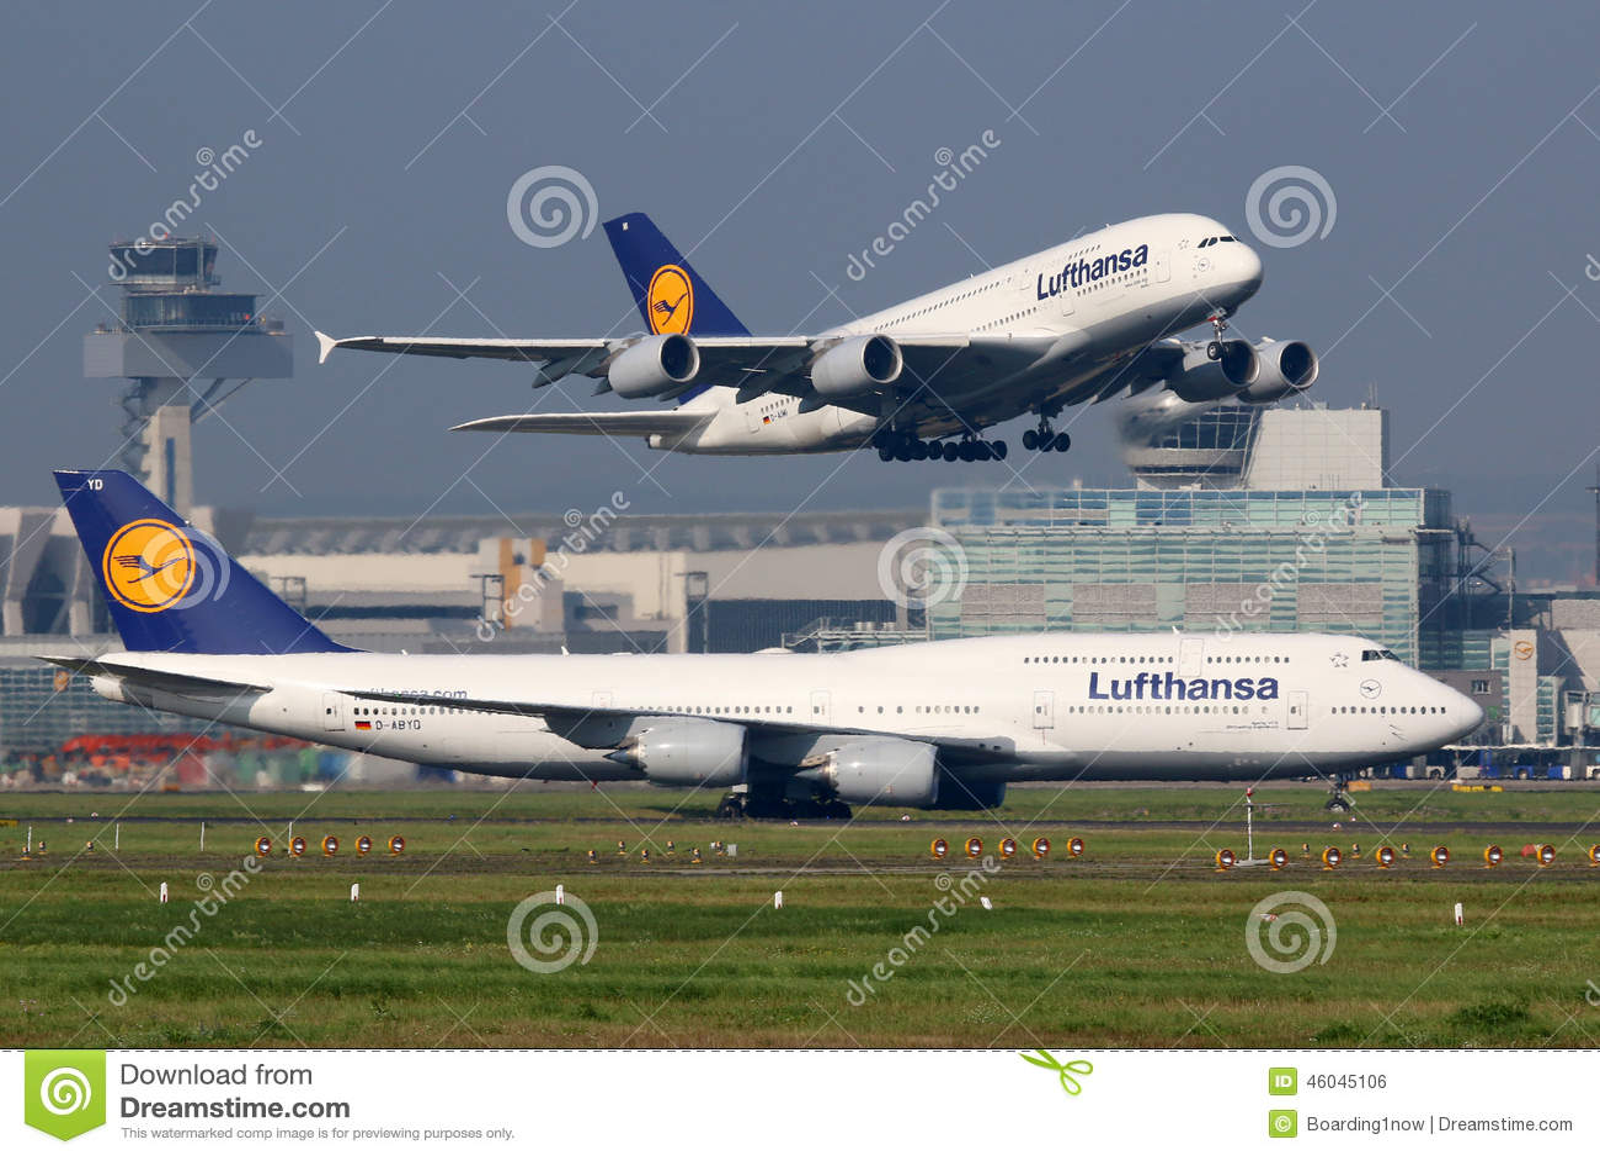 Lufthansa-Vliegtuigen bij de Luchthaven van Frankfurt